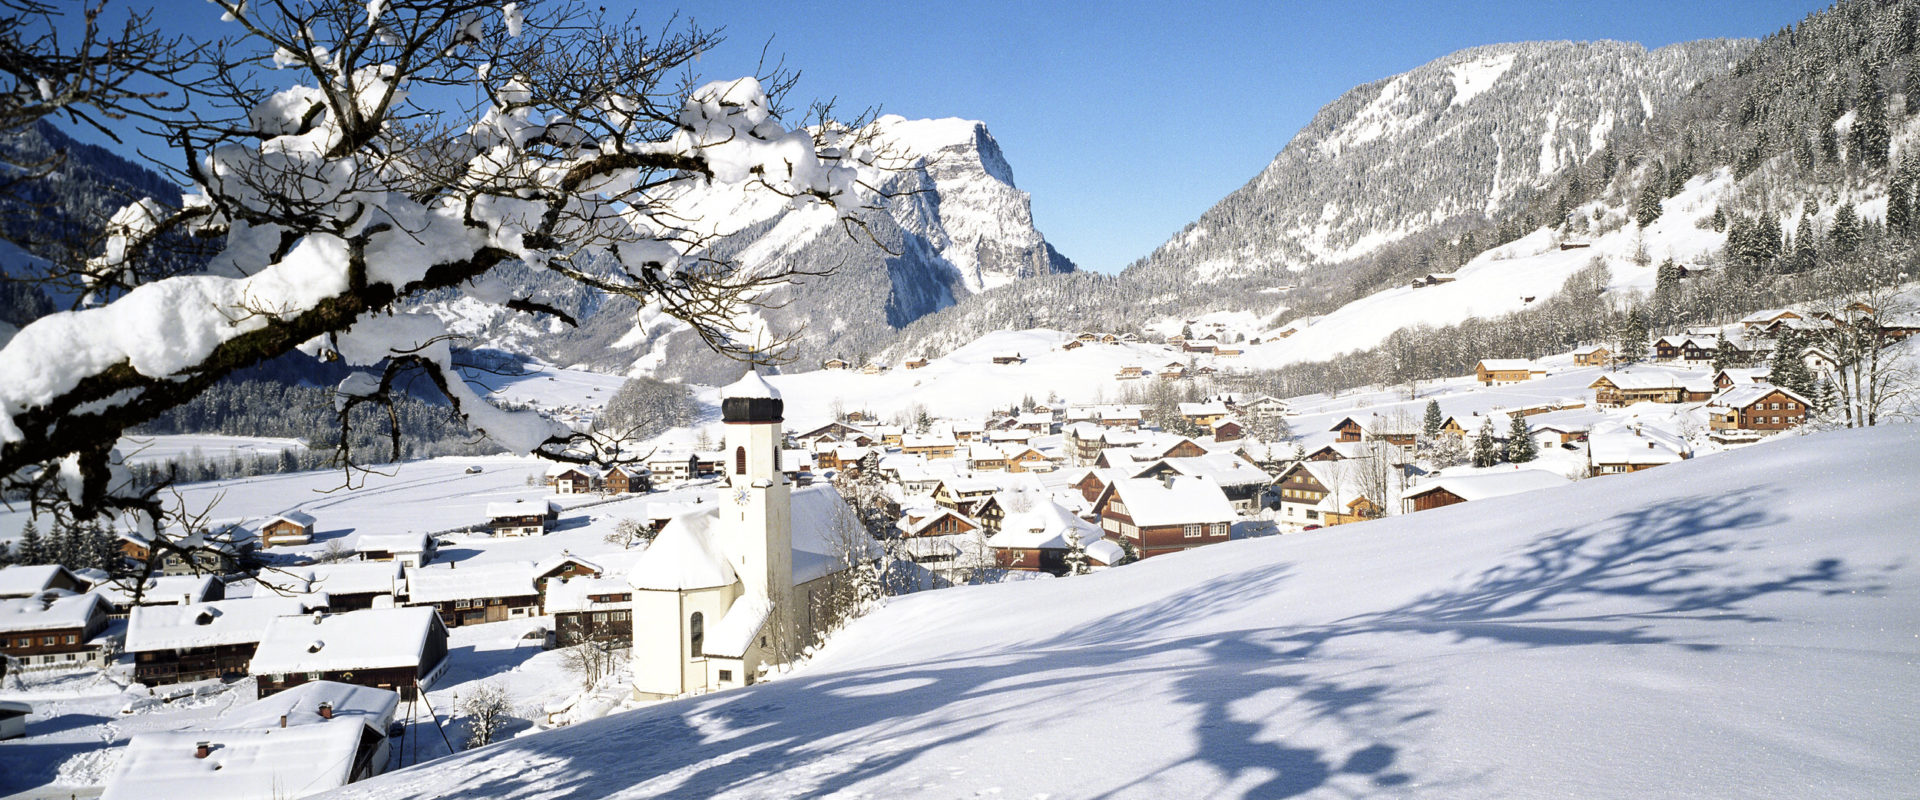 Schoppernau © Christoph Lingg / Bregenzerwald Tourismus